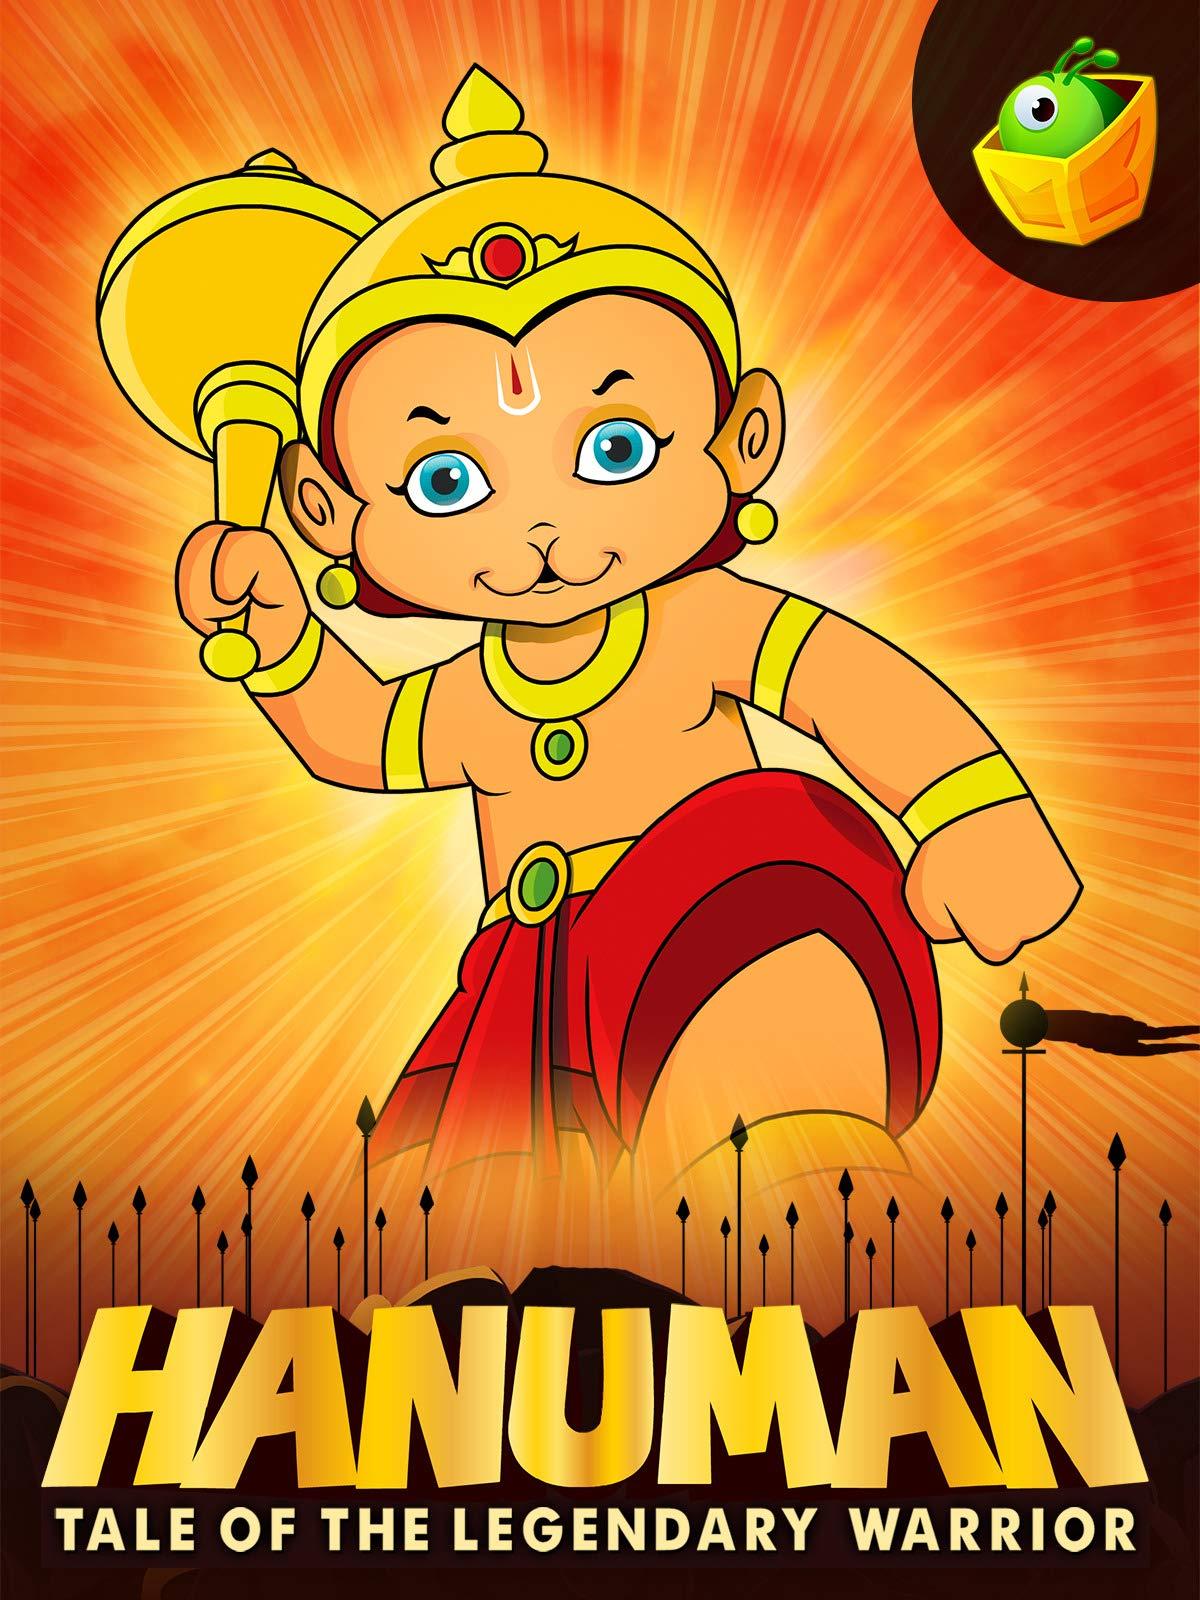 Watch Hanuman Tale Of The Legendary Warrior Prime Video